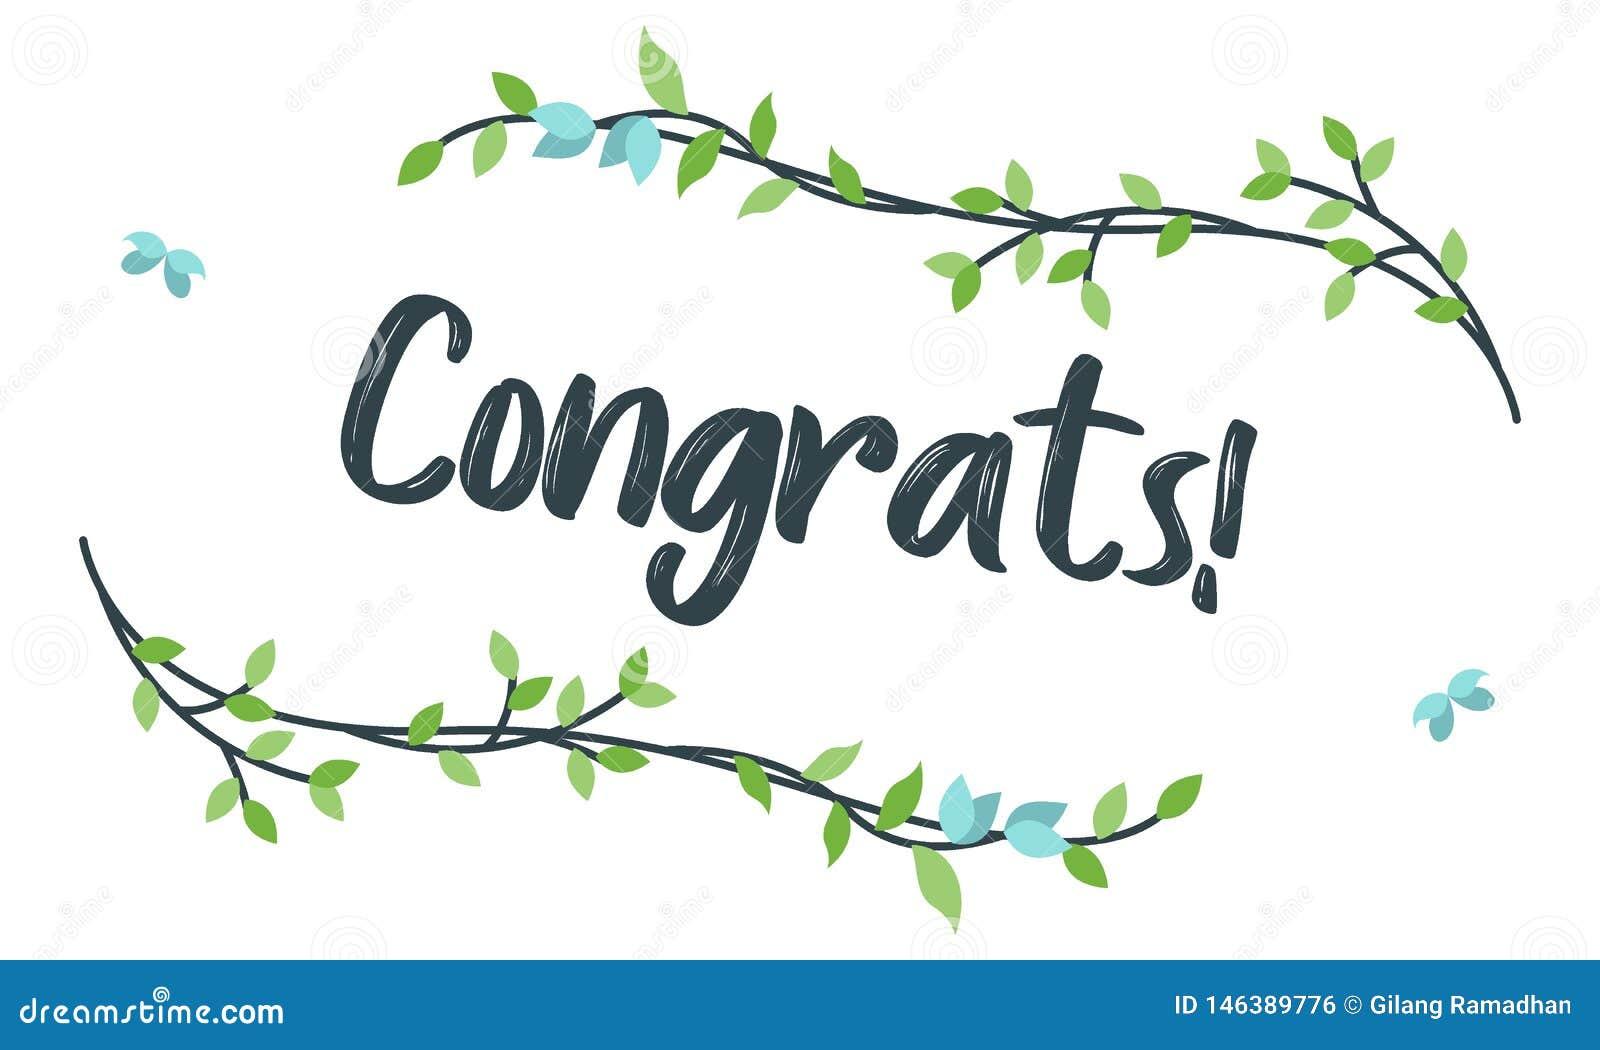 Congrats, τυπογραφία συγχαρητηρίων με το Floral πλαίσιο, διάνυσμα για το χαιρετισμό